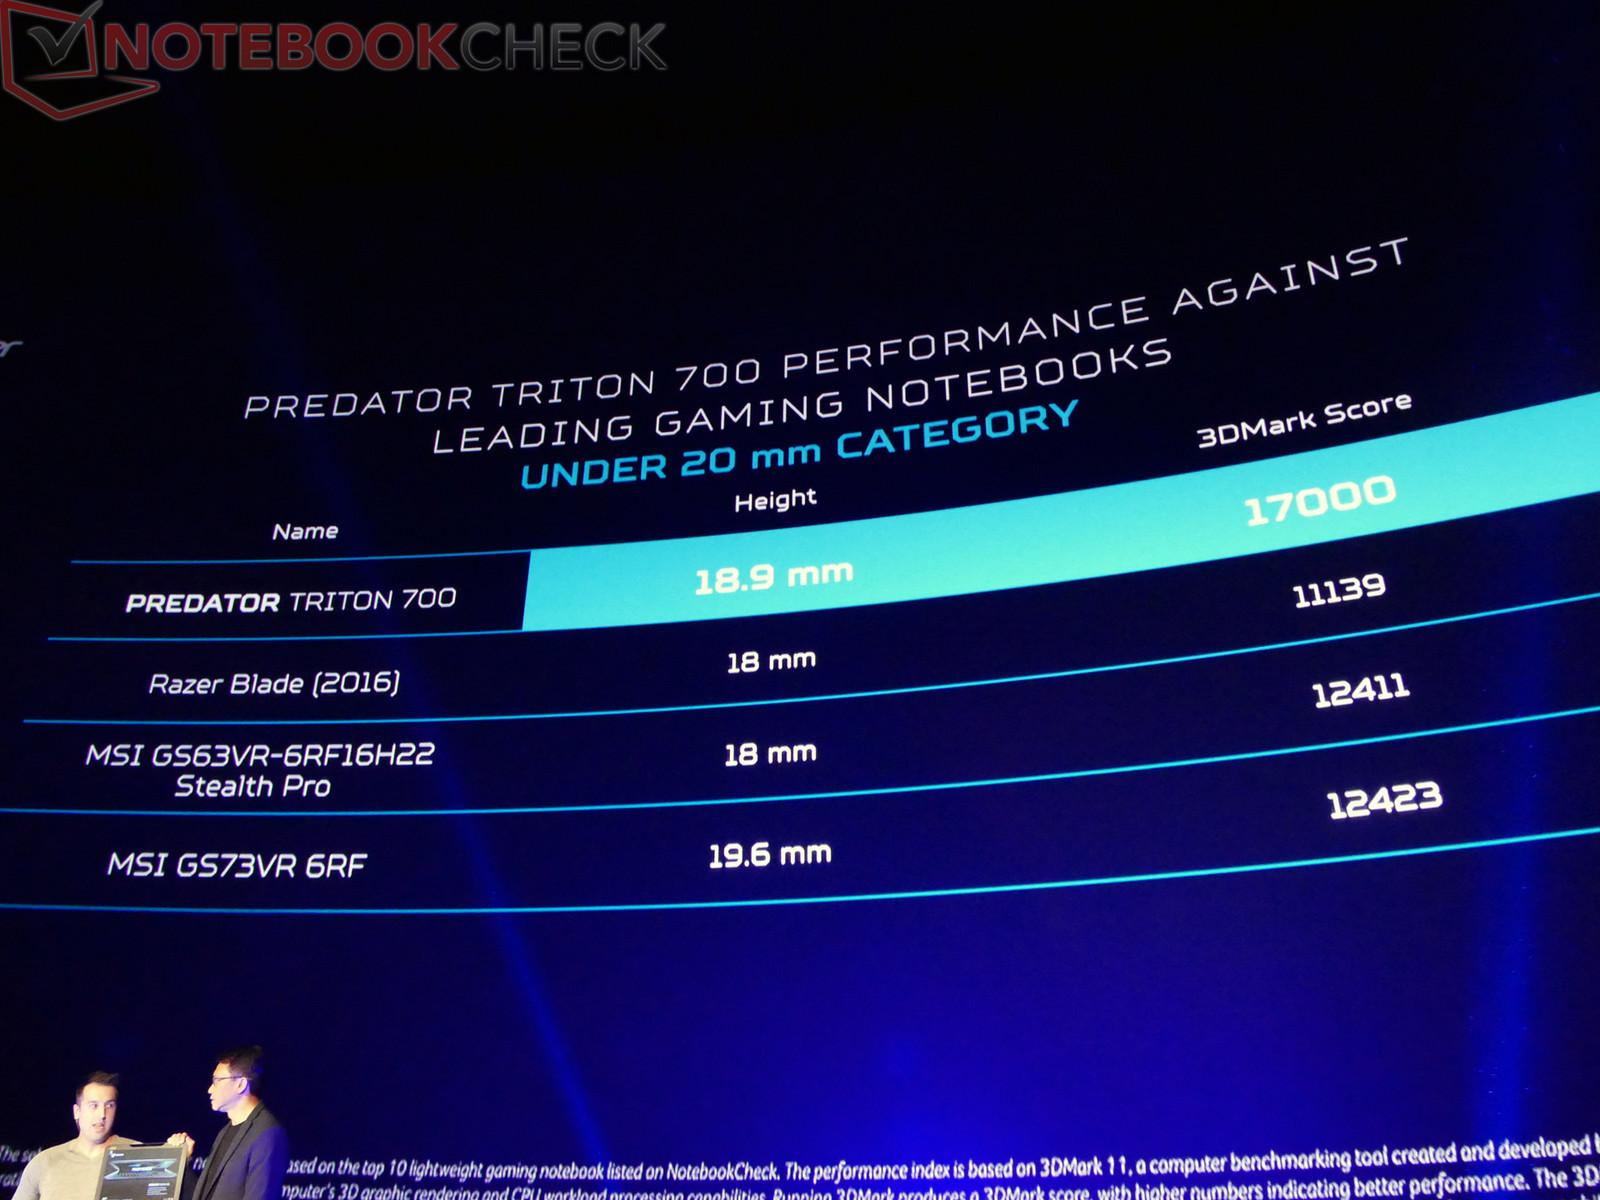 NVIDIA preparing new mobile GeForce GTX 1080 and 1070